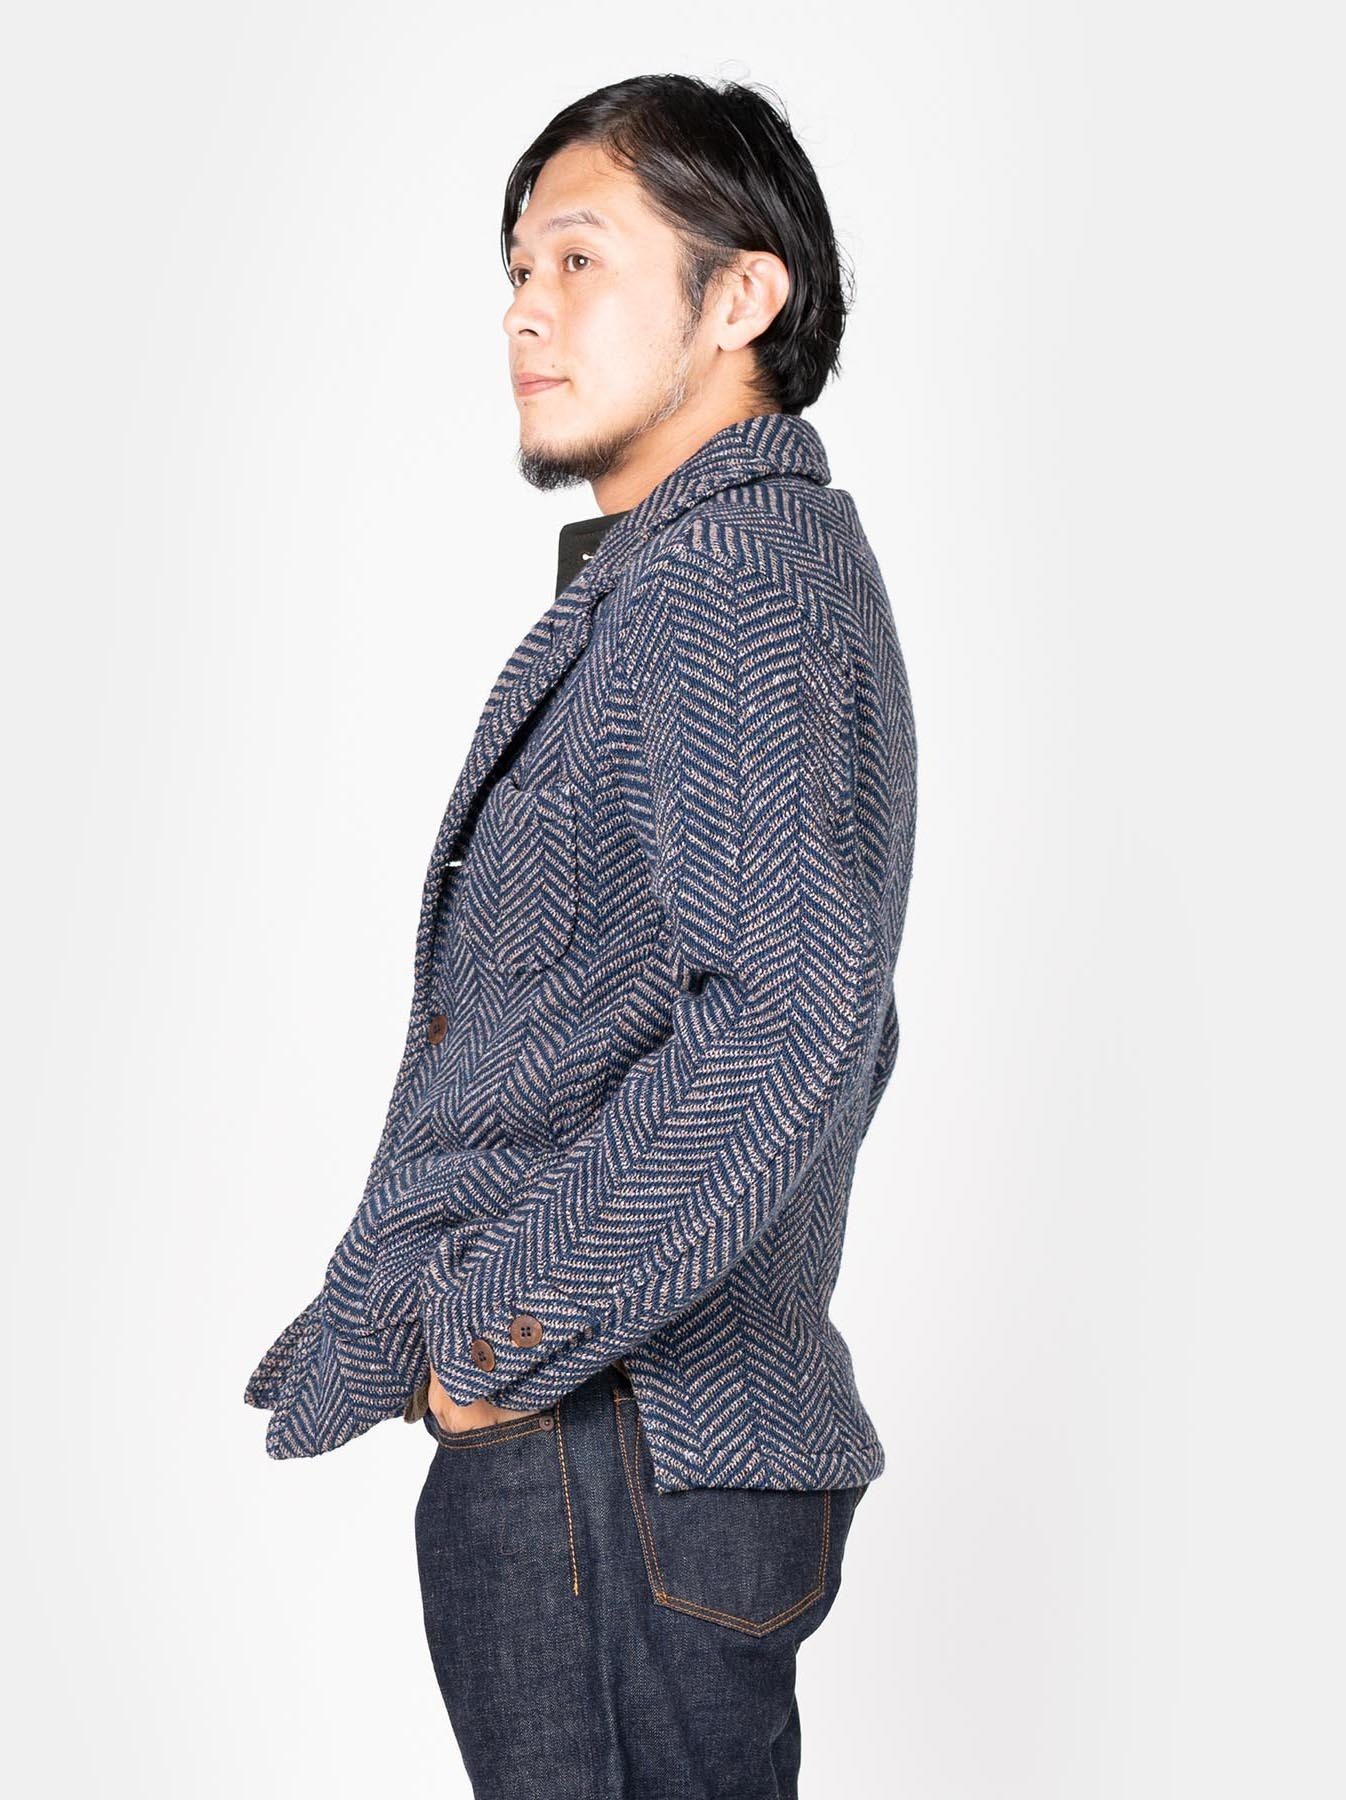 Indigo Cotton Tweed Knit Jacket-4